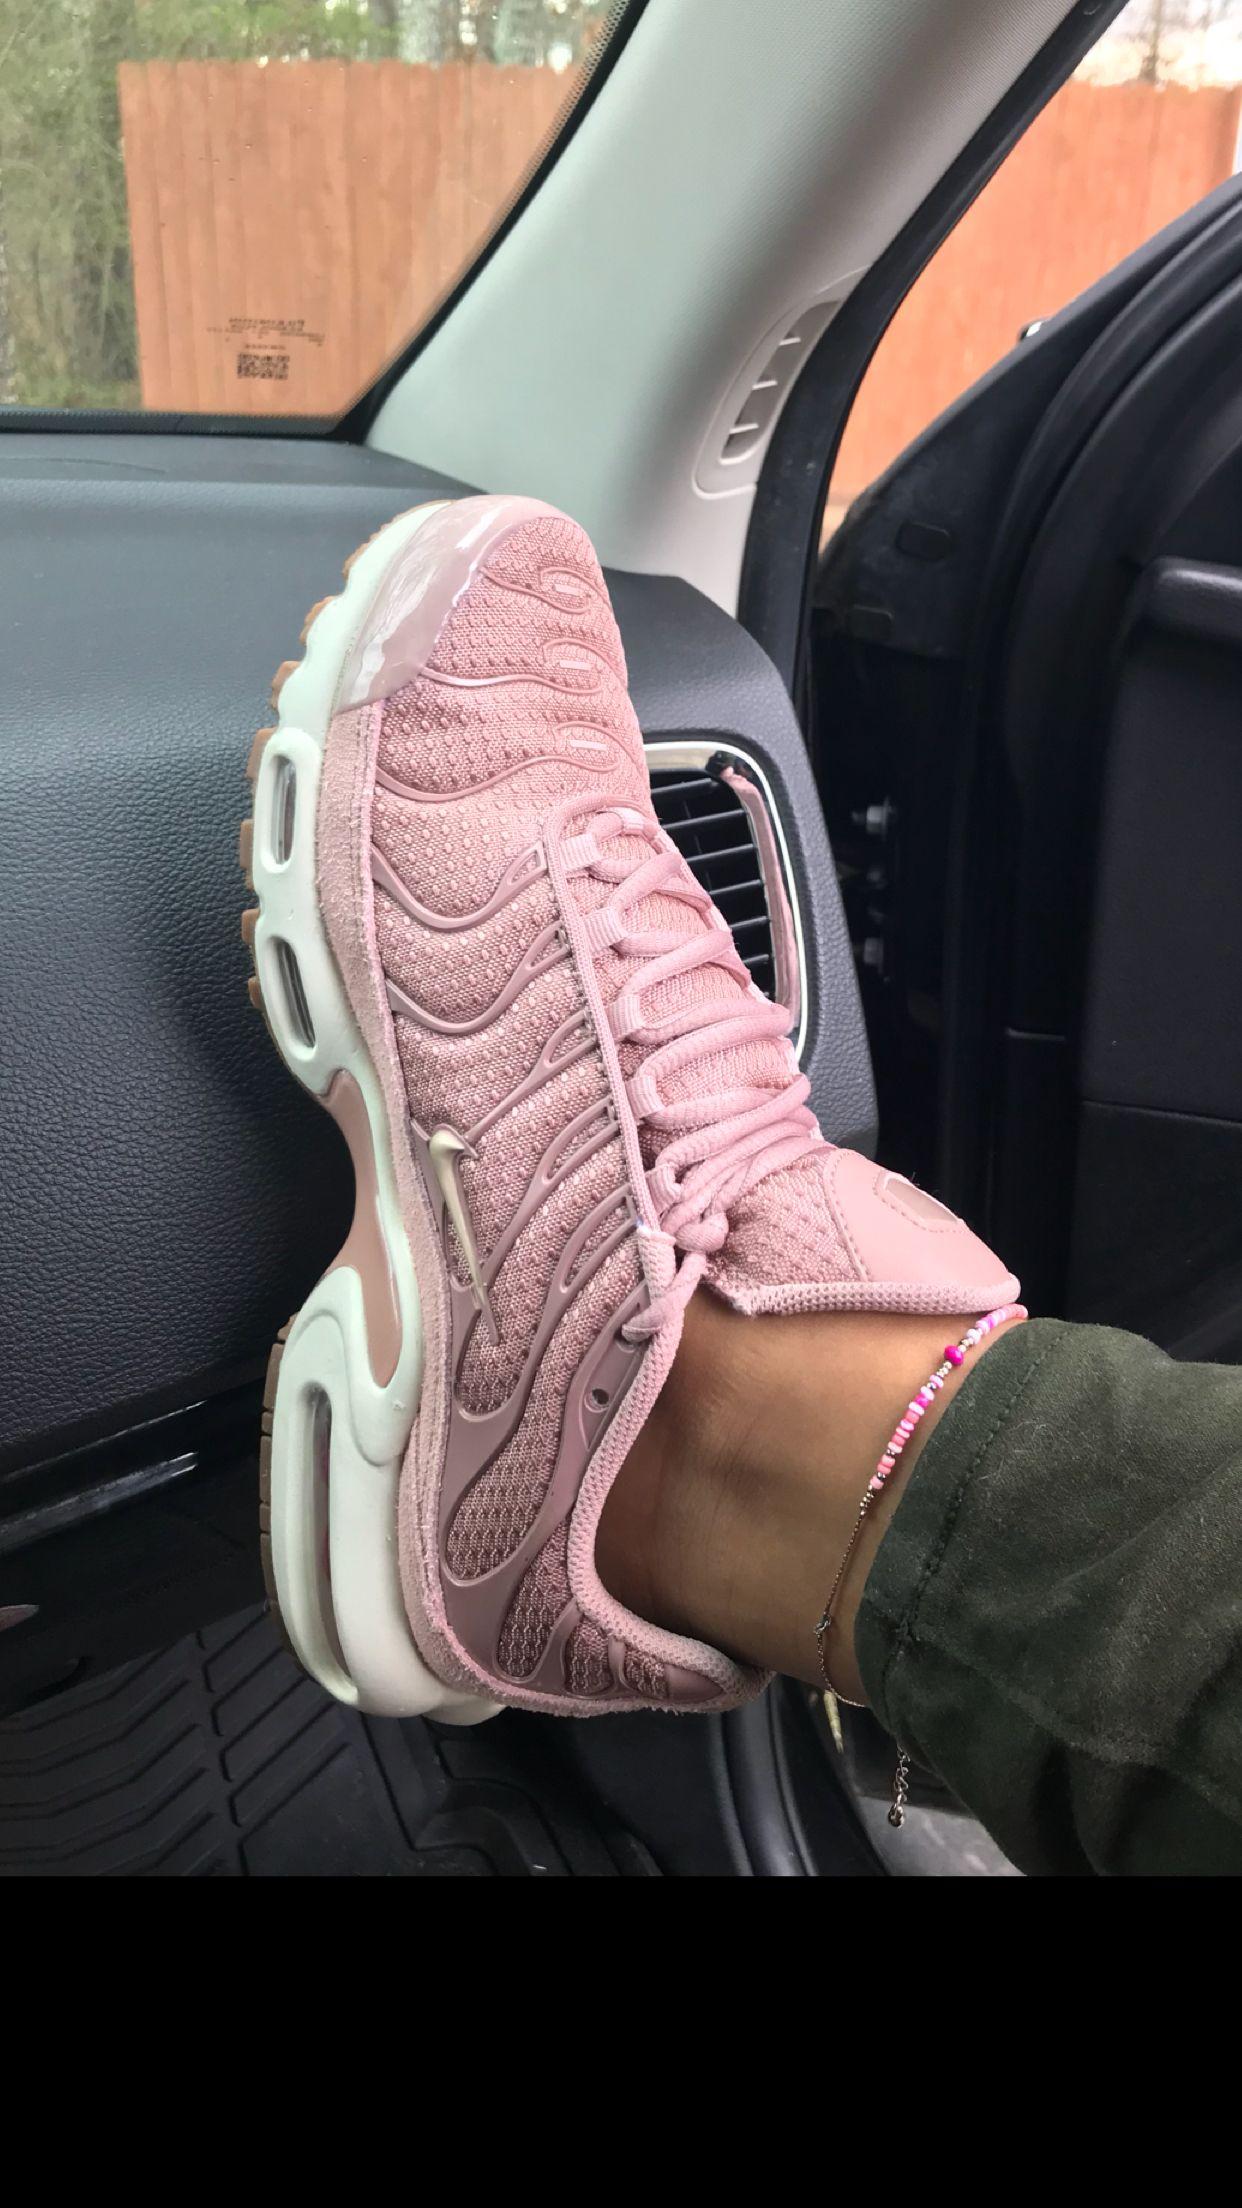 quality design 87293 42c89 Air max plus | Air maxxxxx in 2019 | Shoes sneakers ...